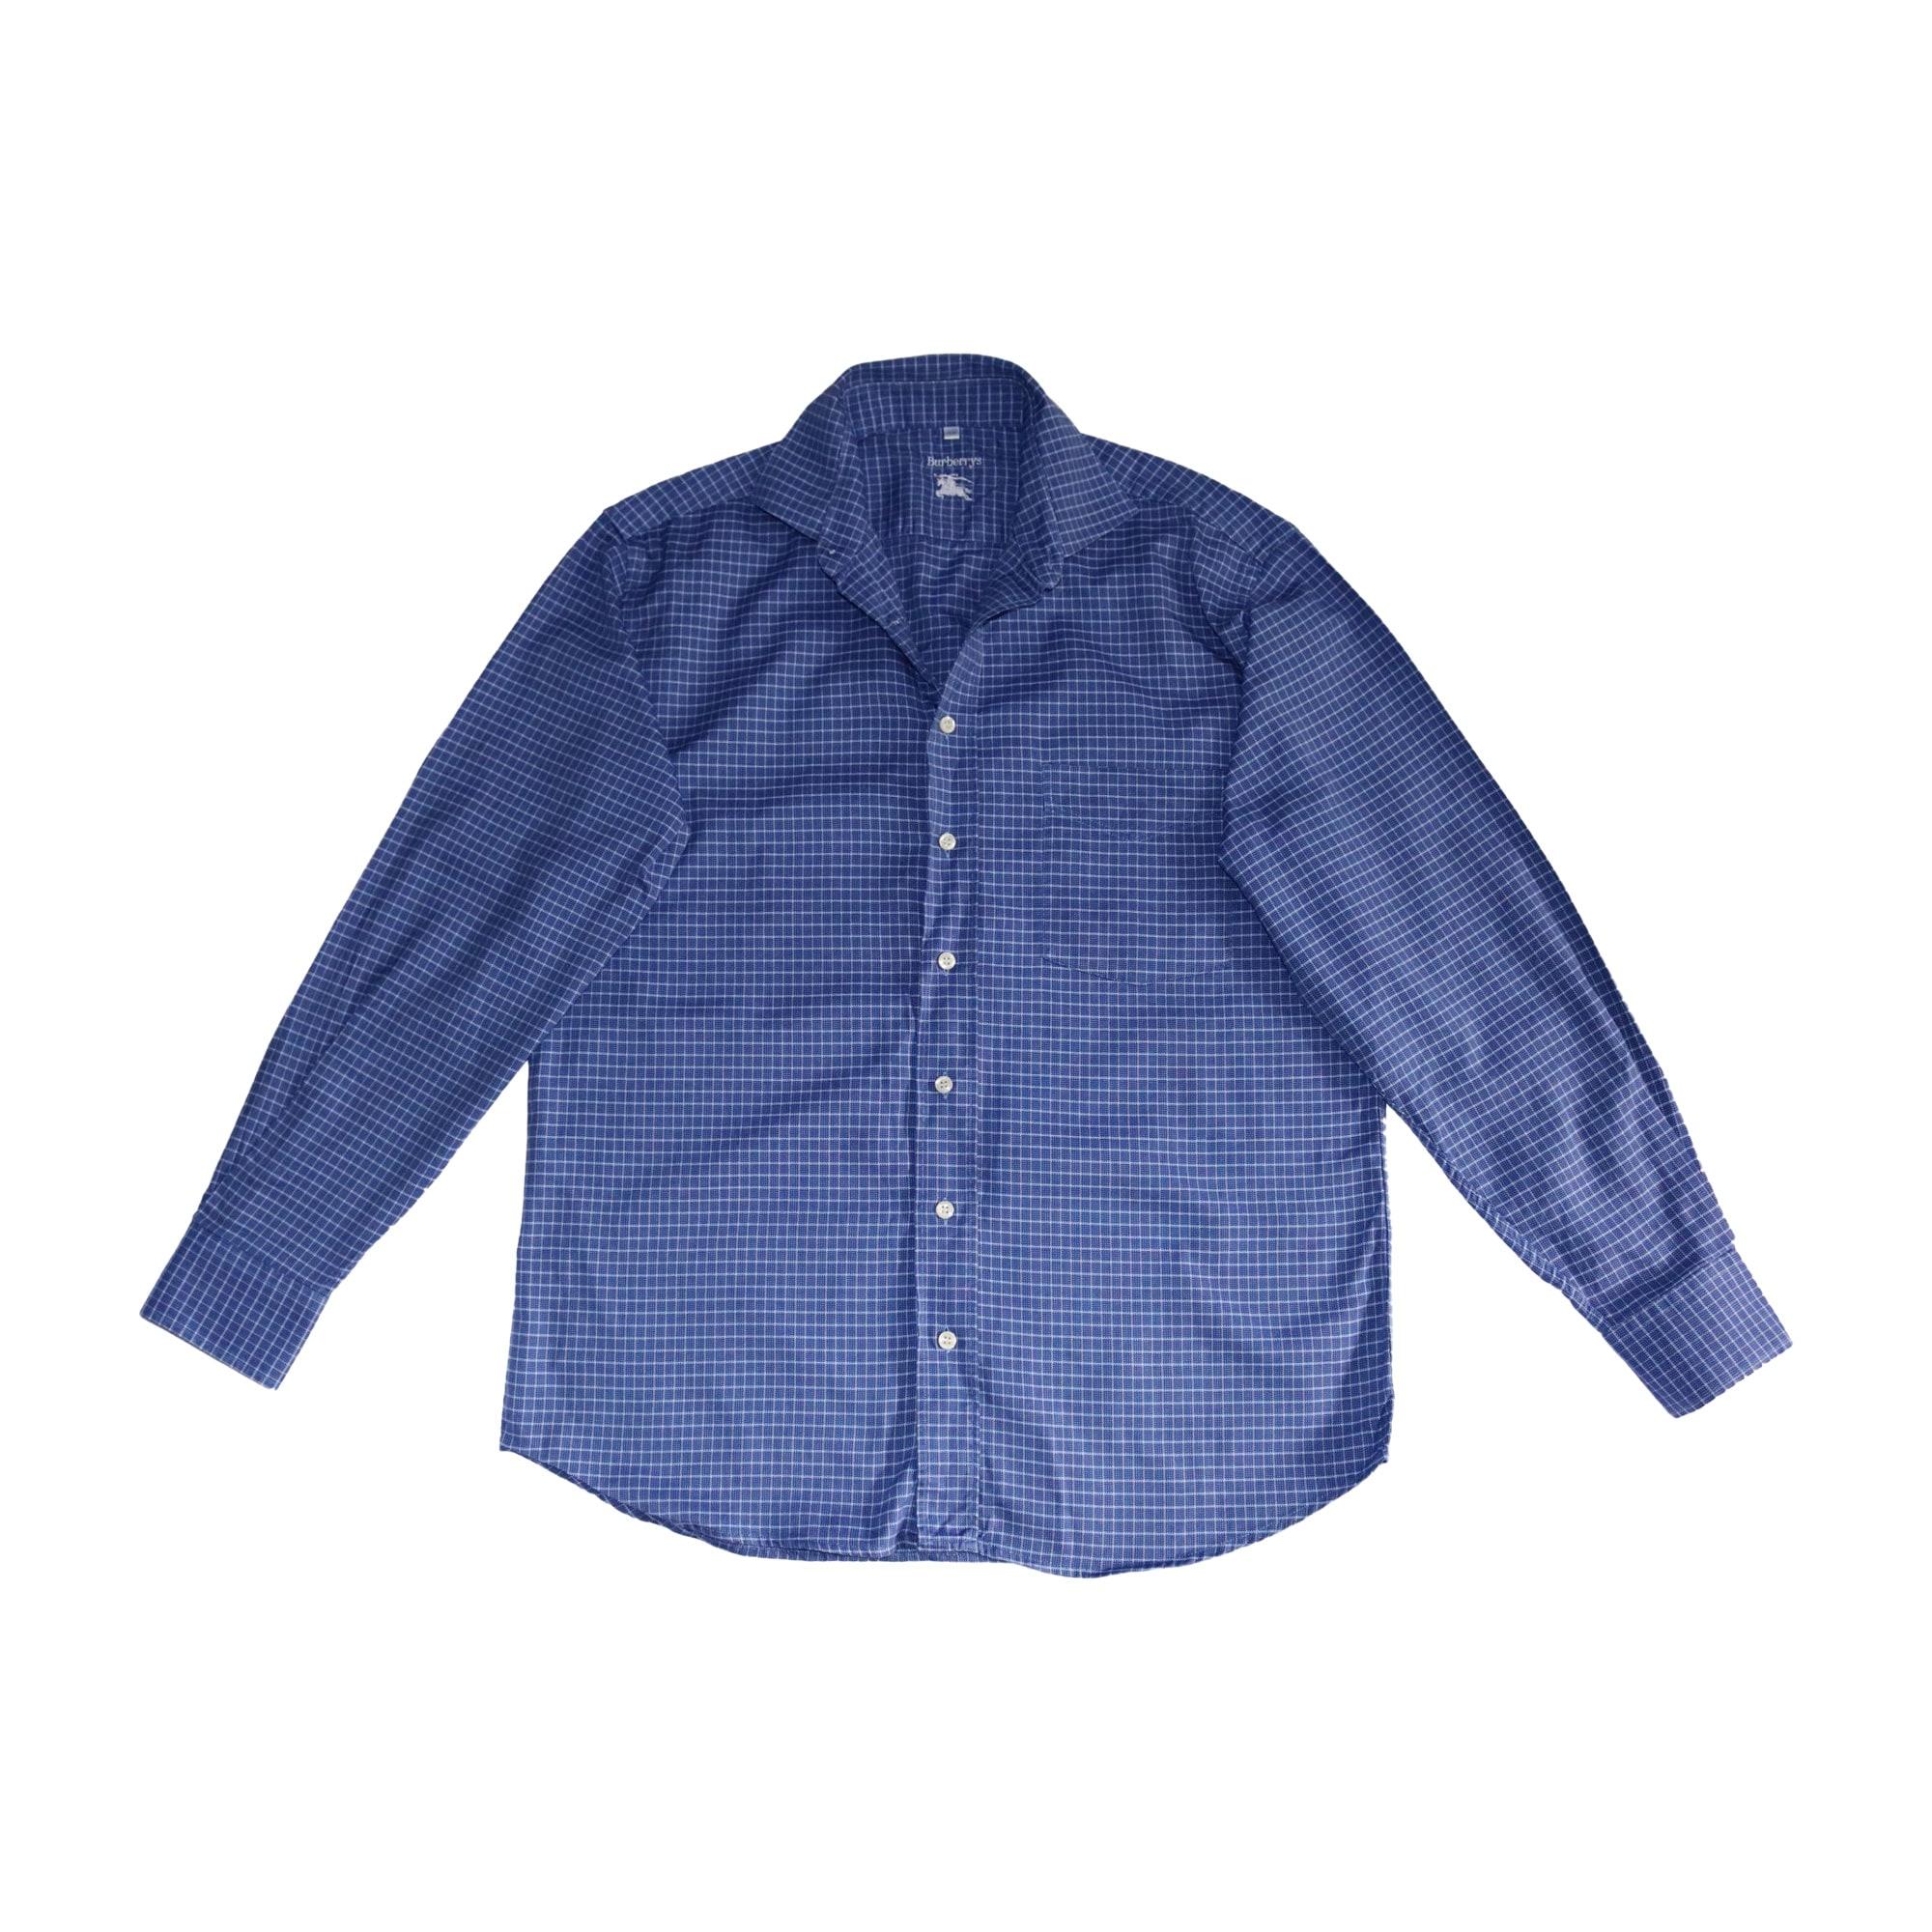 Chemise BURBERRY Bleu, bleu marine, bleu turquoise